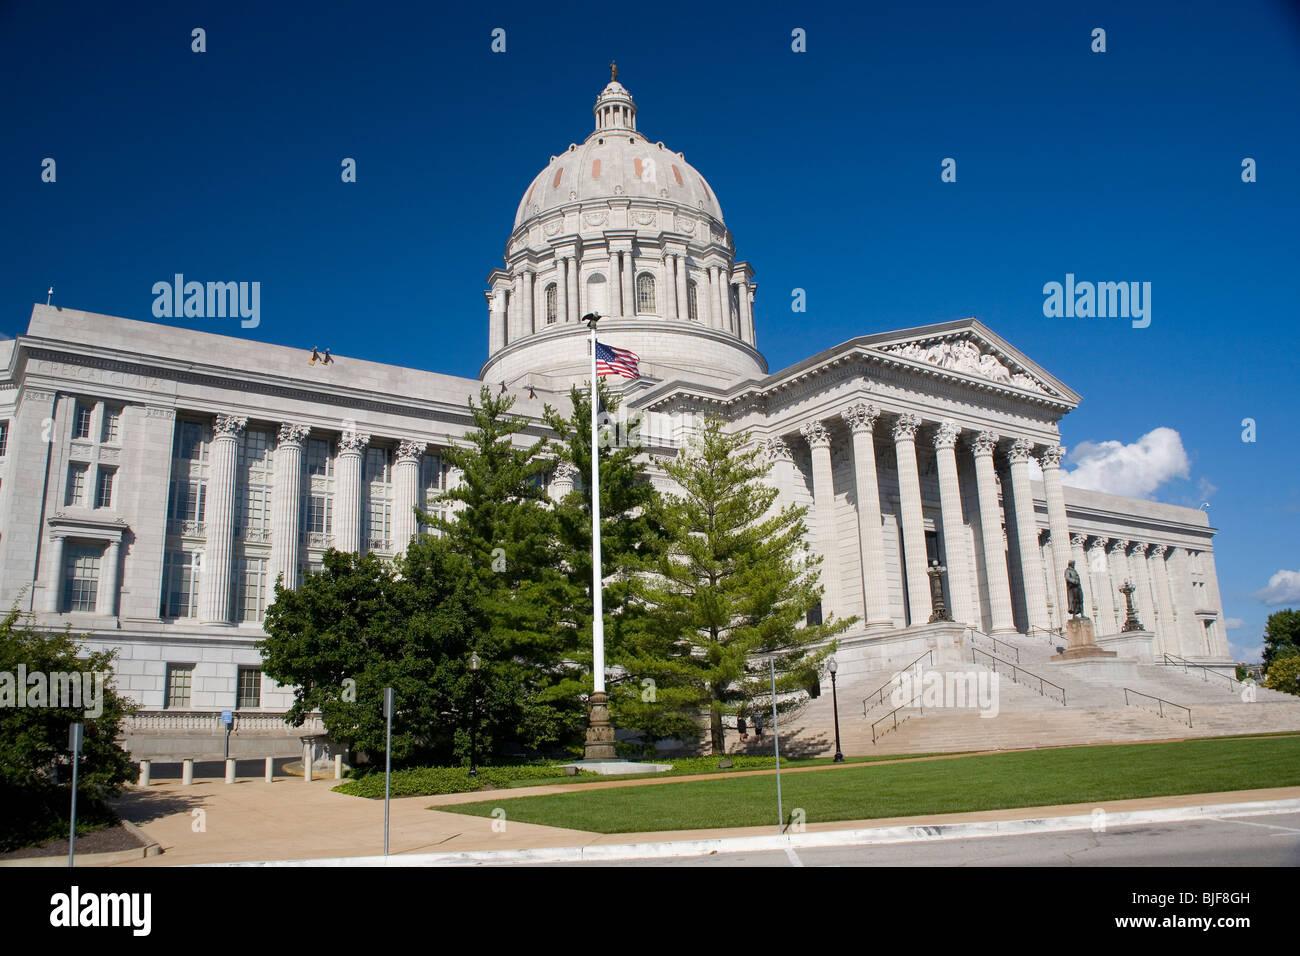 Missouri State Capitol - Stock Image